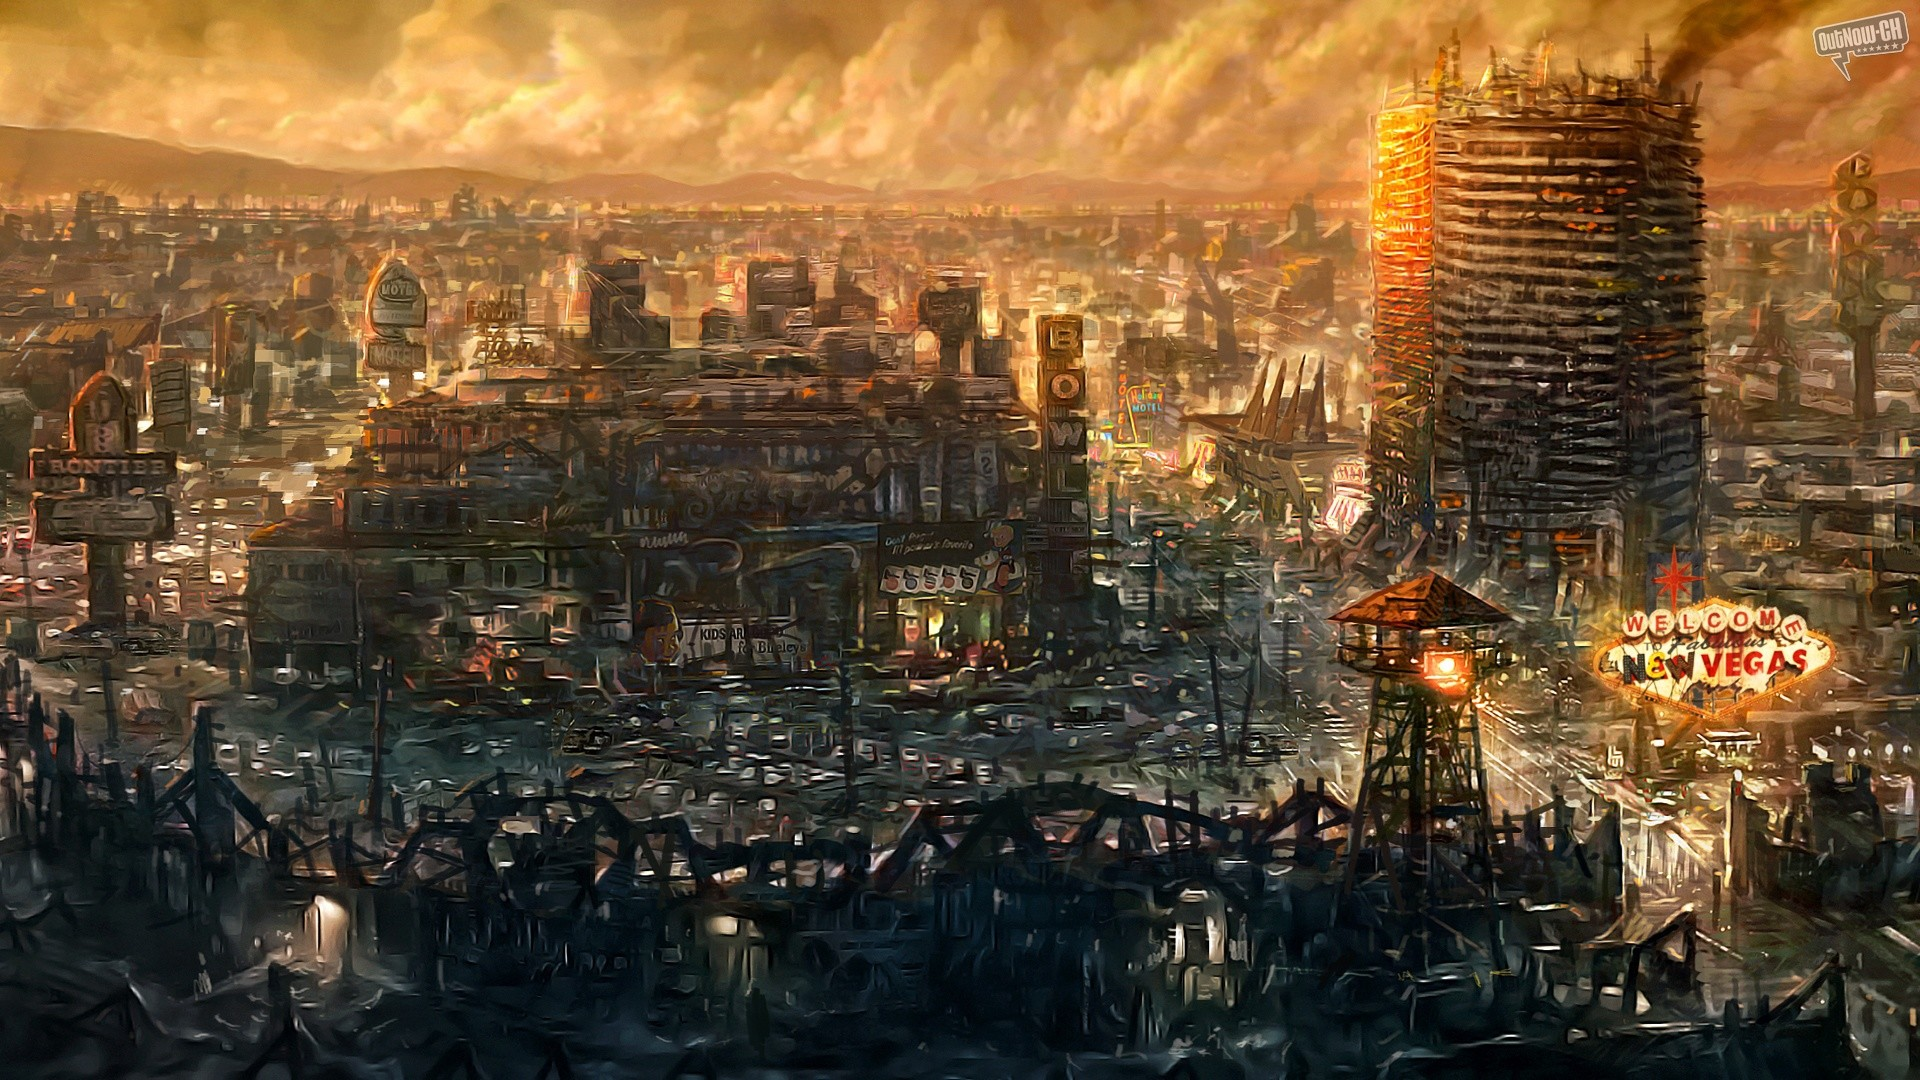 ws_Fallout-_New_Vegas_1920x1080.jpg, …